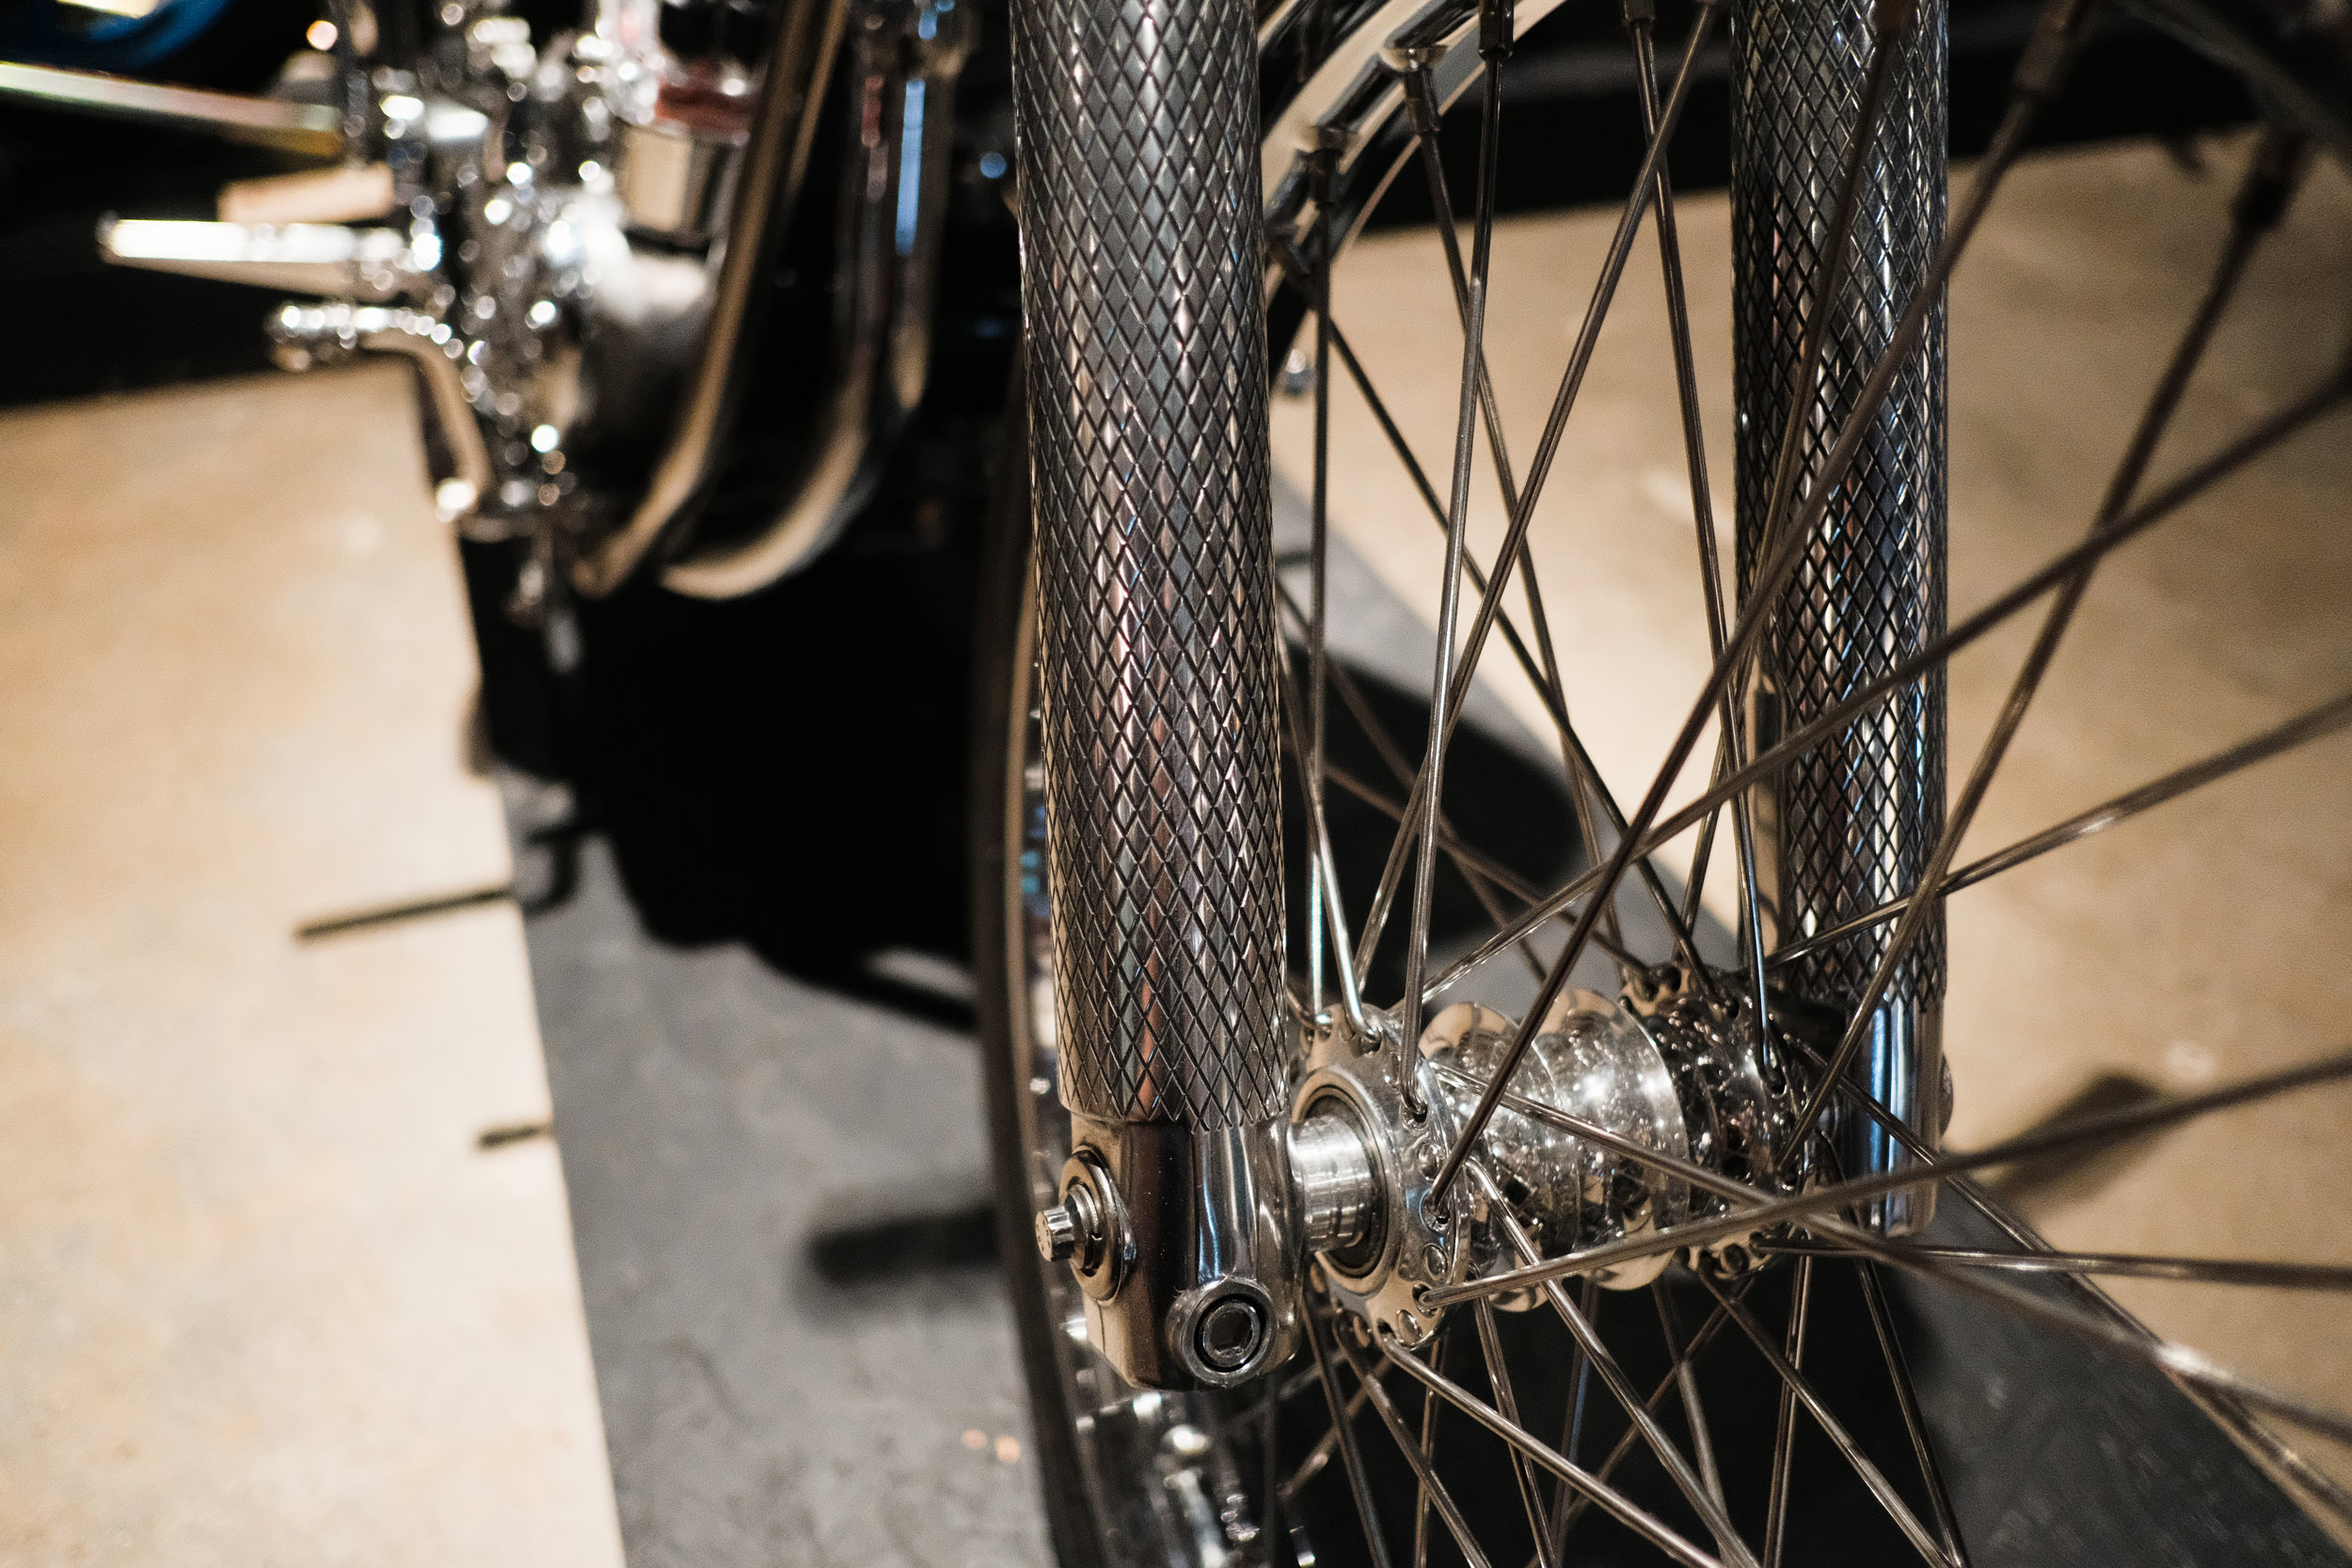 Handbuilt-Motorcycle-Show-2017-8438.jpg